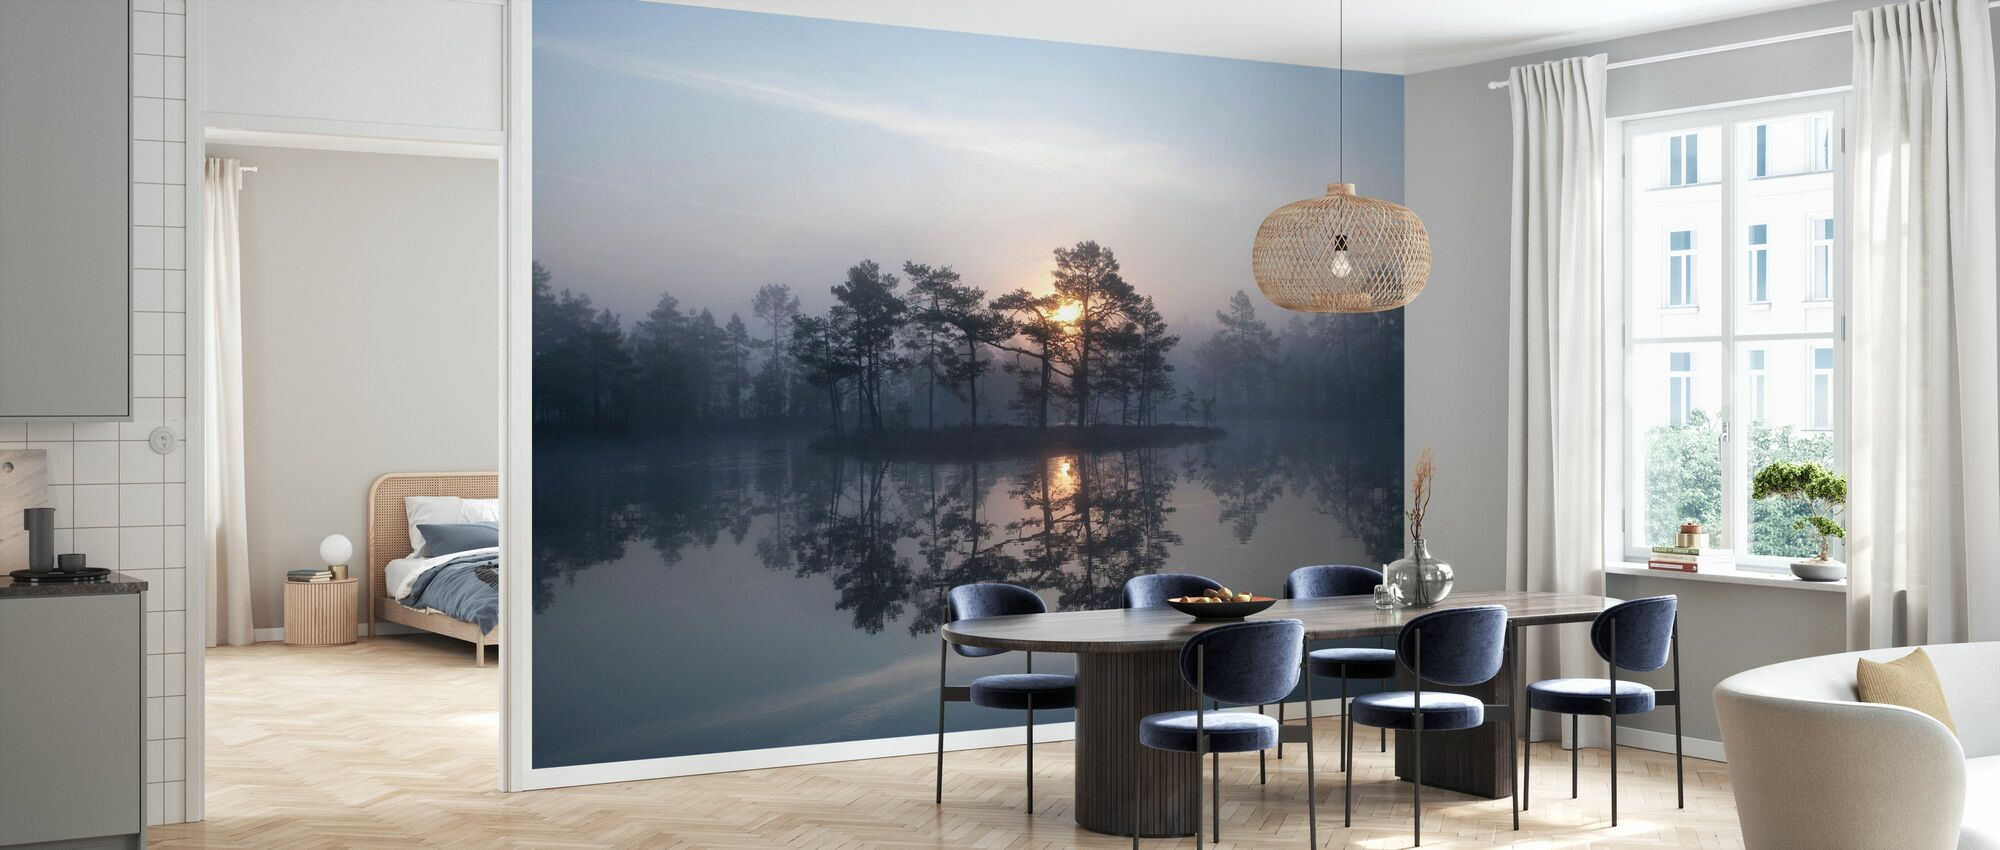 Betoverende mist - Behang - Keuken